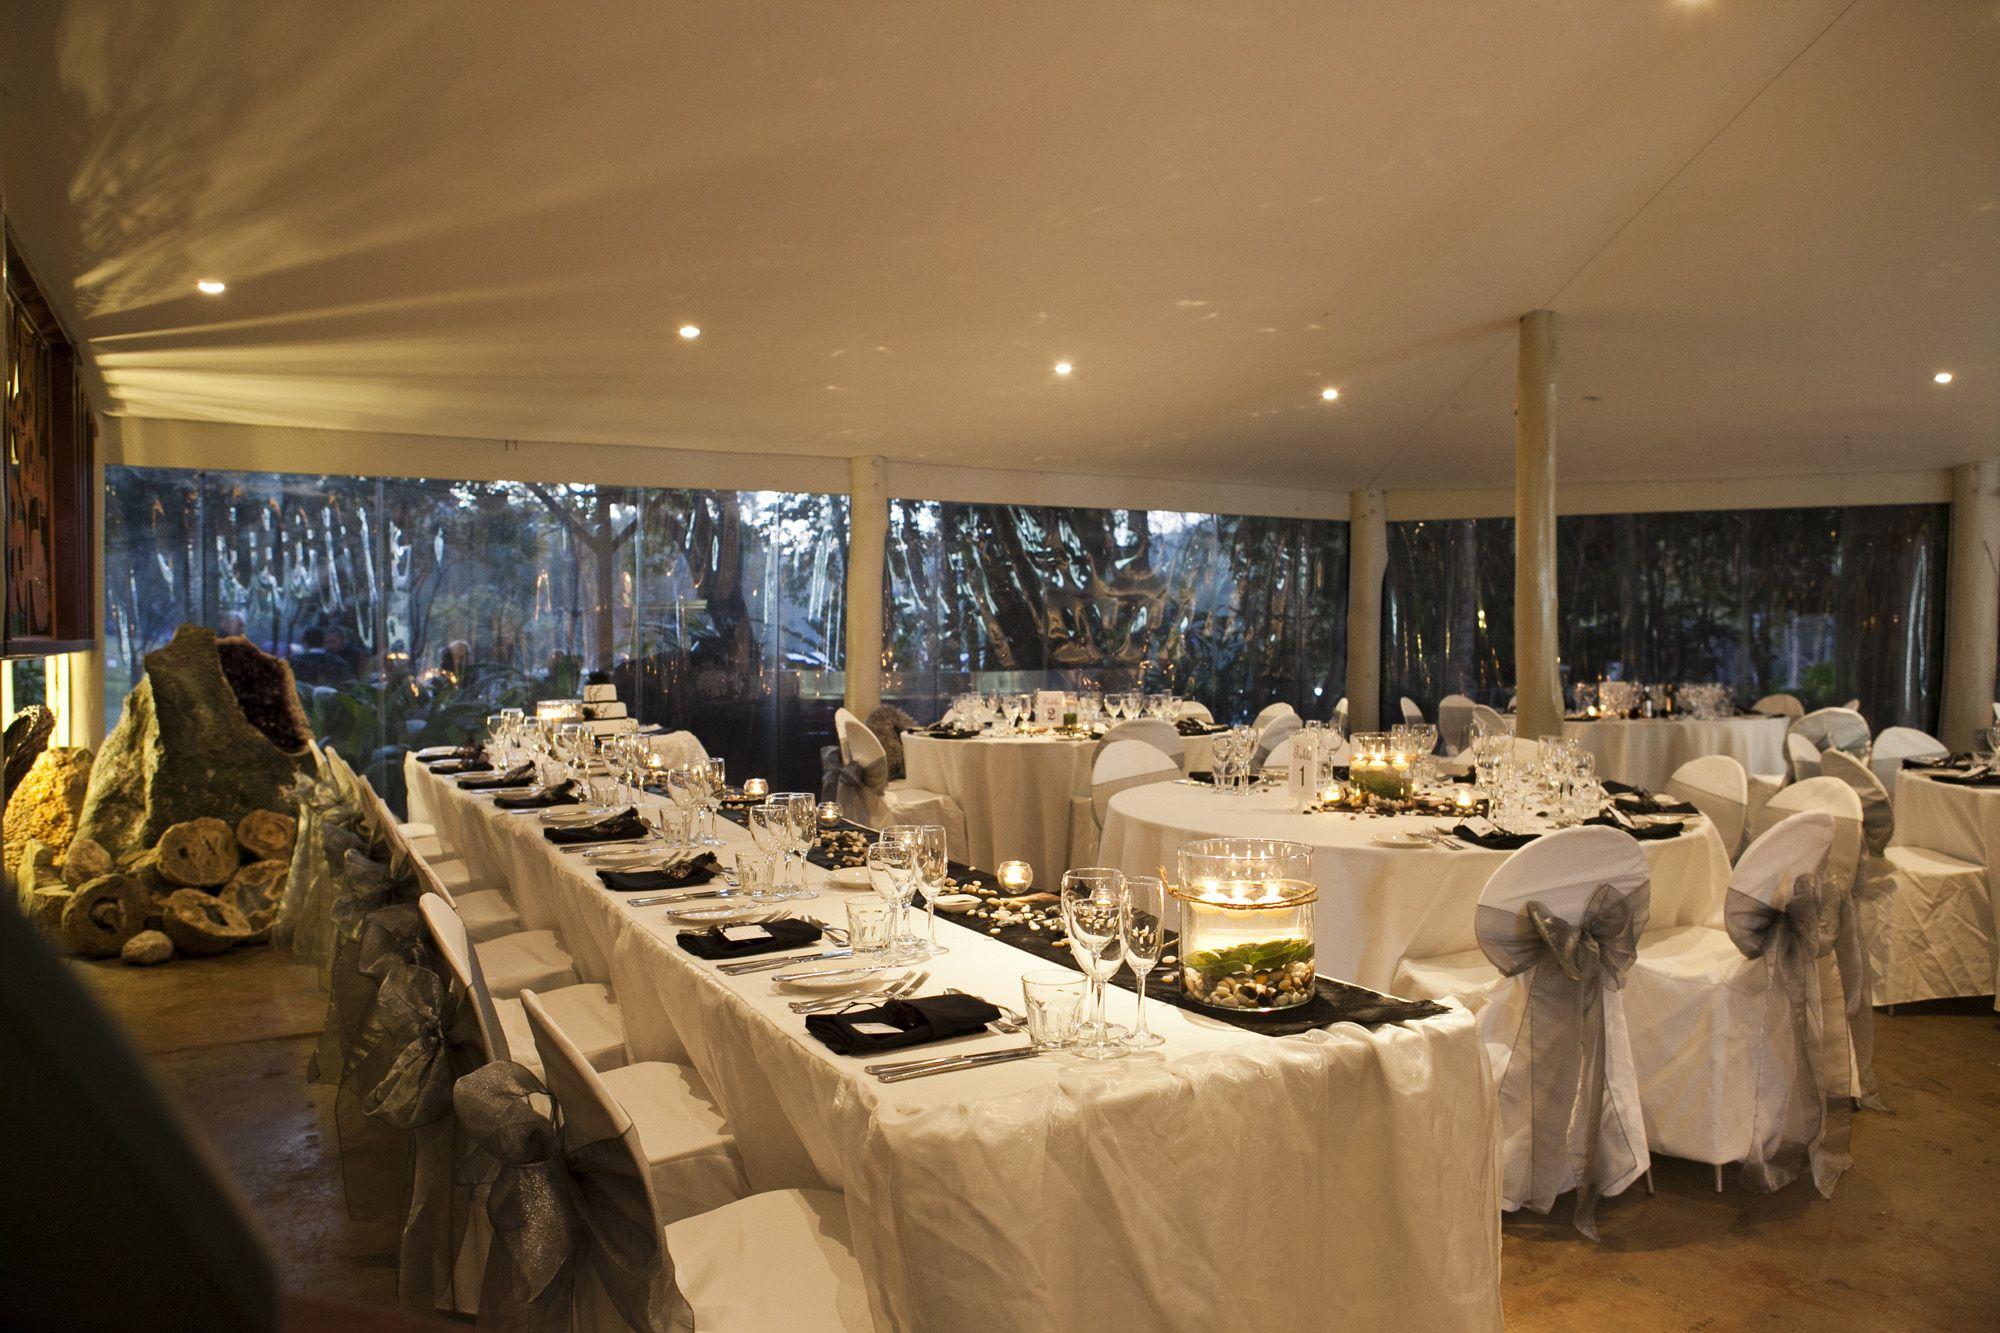 wedding receptions gold coast qld%0A Rainforest Wedding Ceremony and Reception   Weddings   Pinterest   Gold  coast  Tamborine mountain and Reception